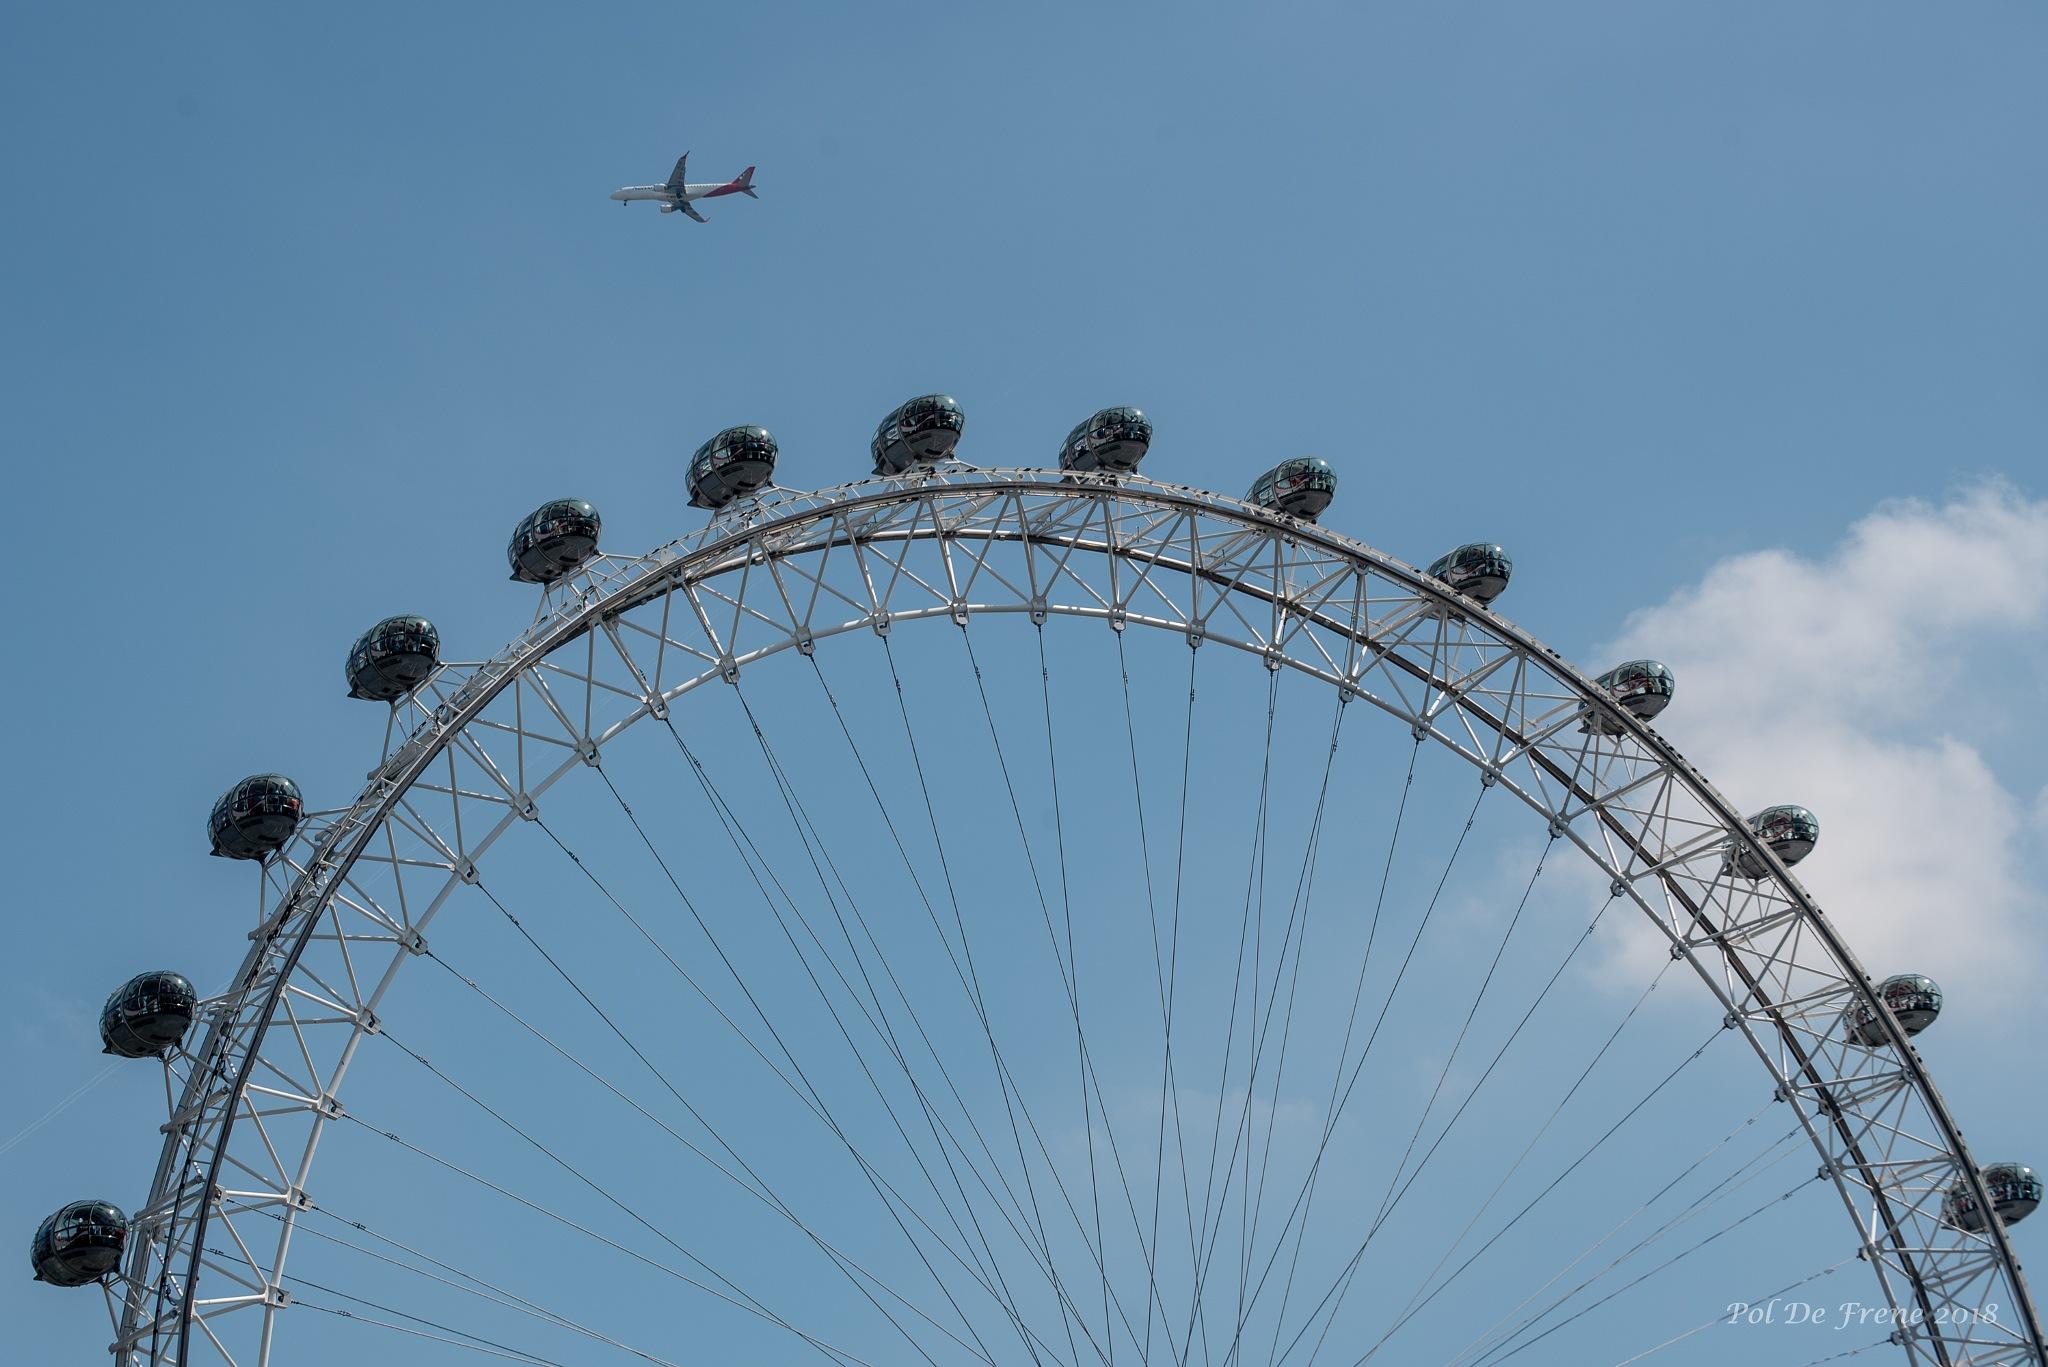 London eye by poldefrene